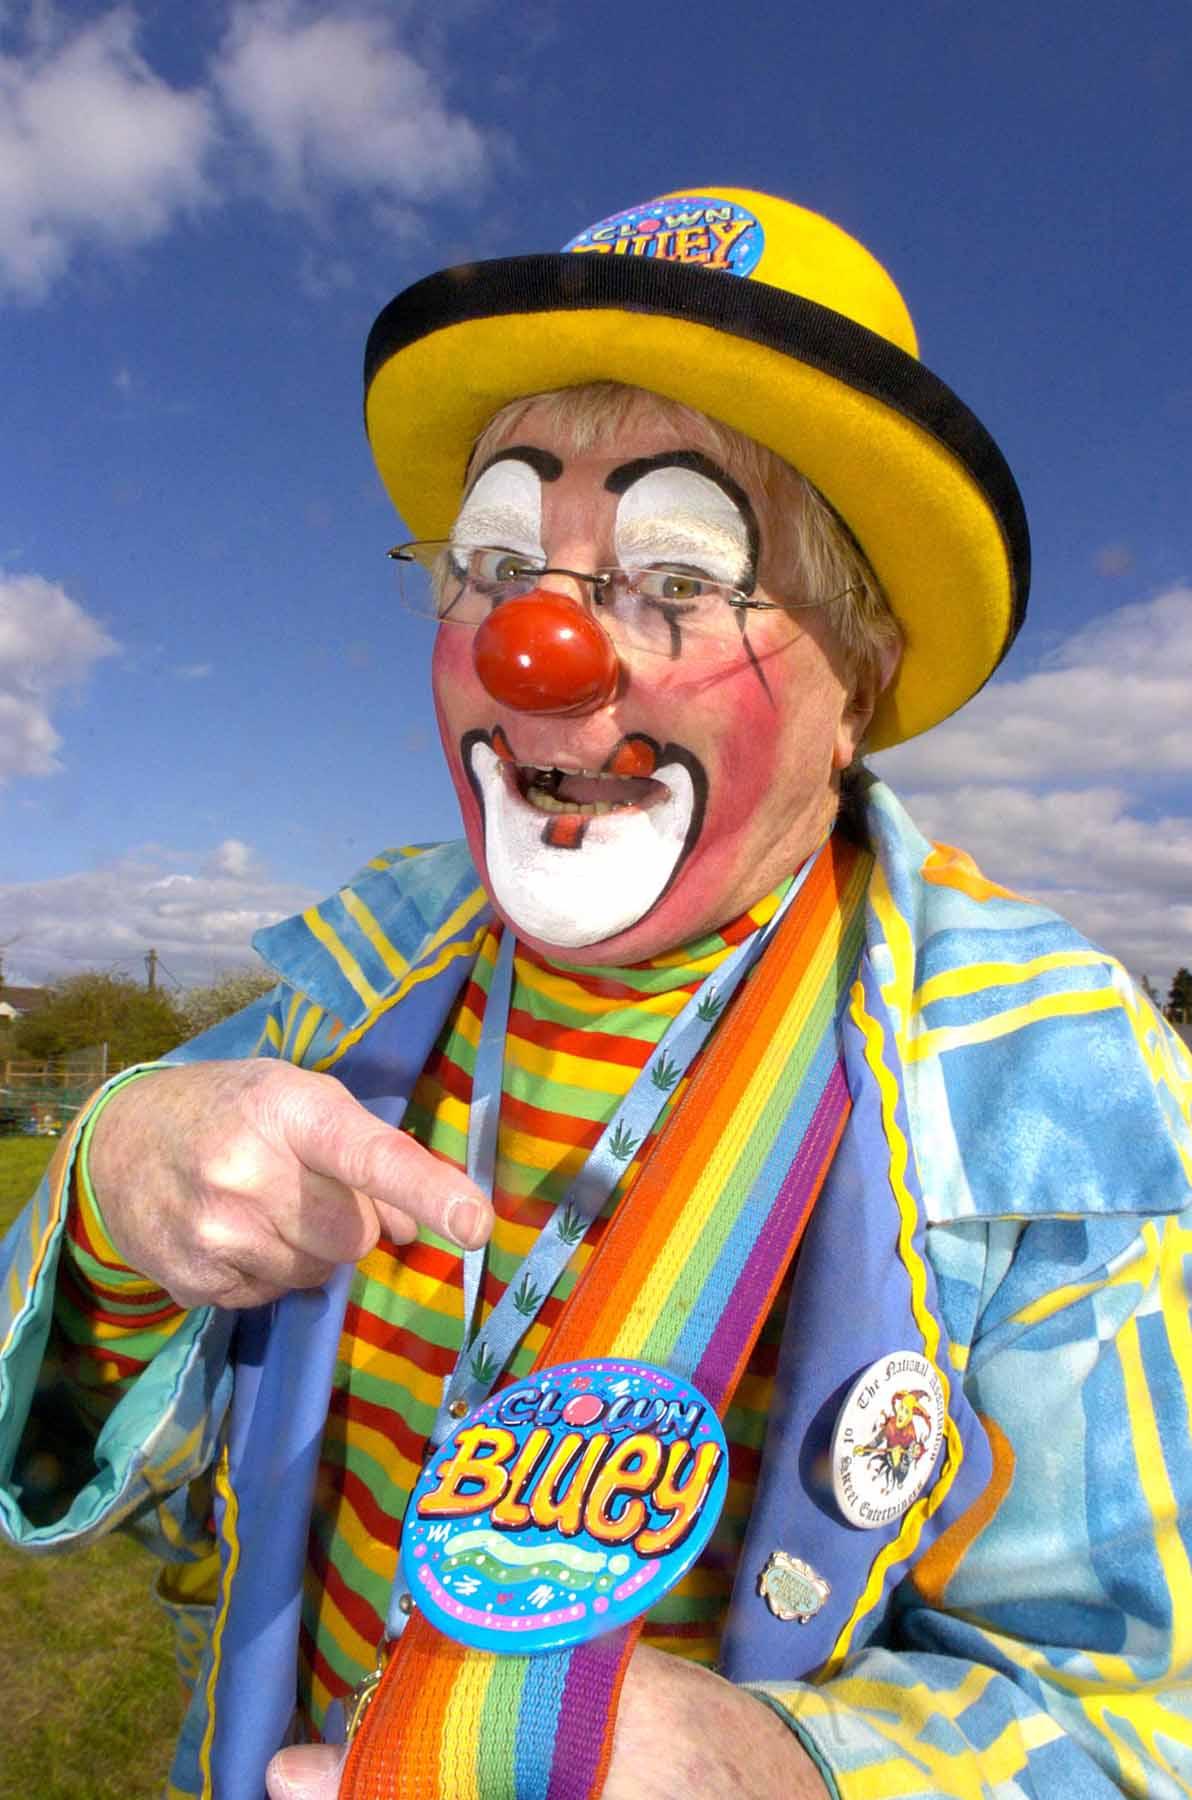 clown bluey laughter is god u0027s sunshine